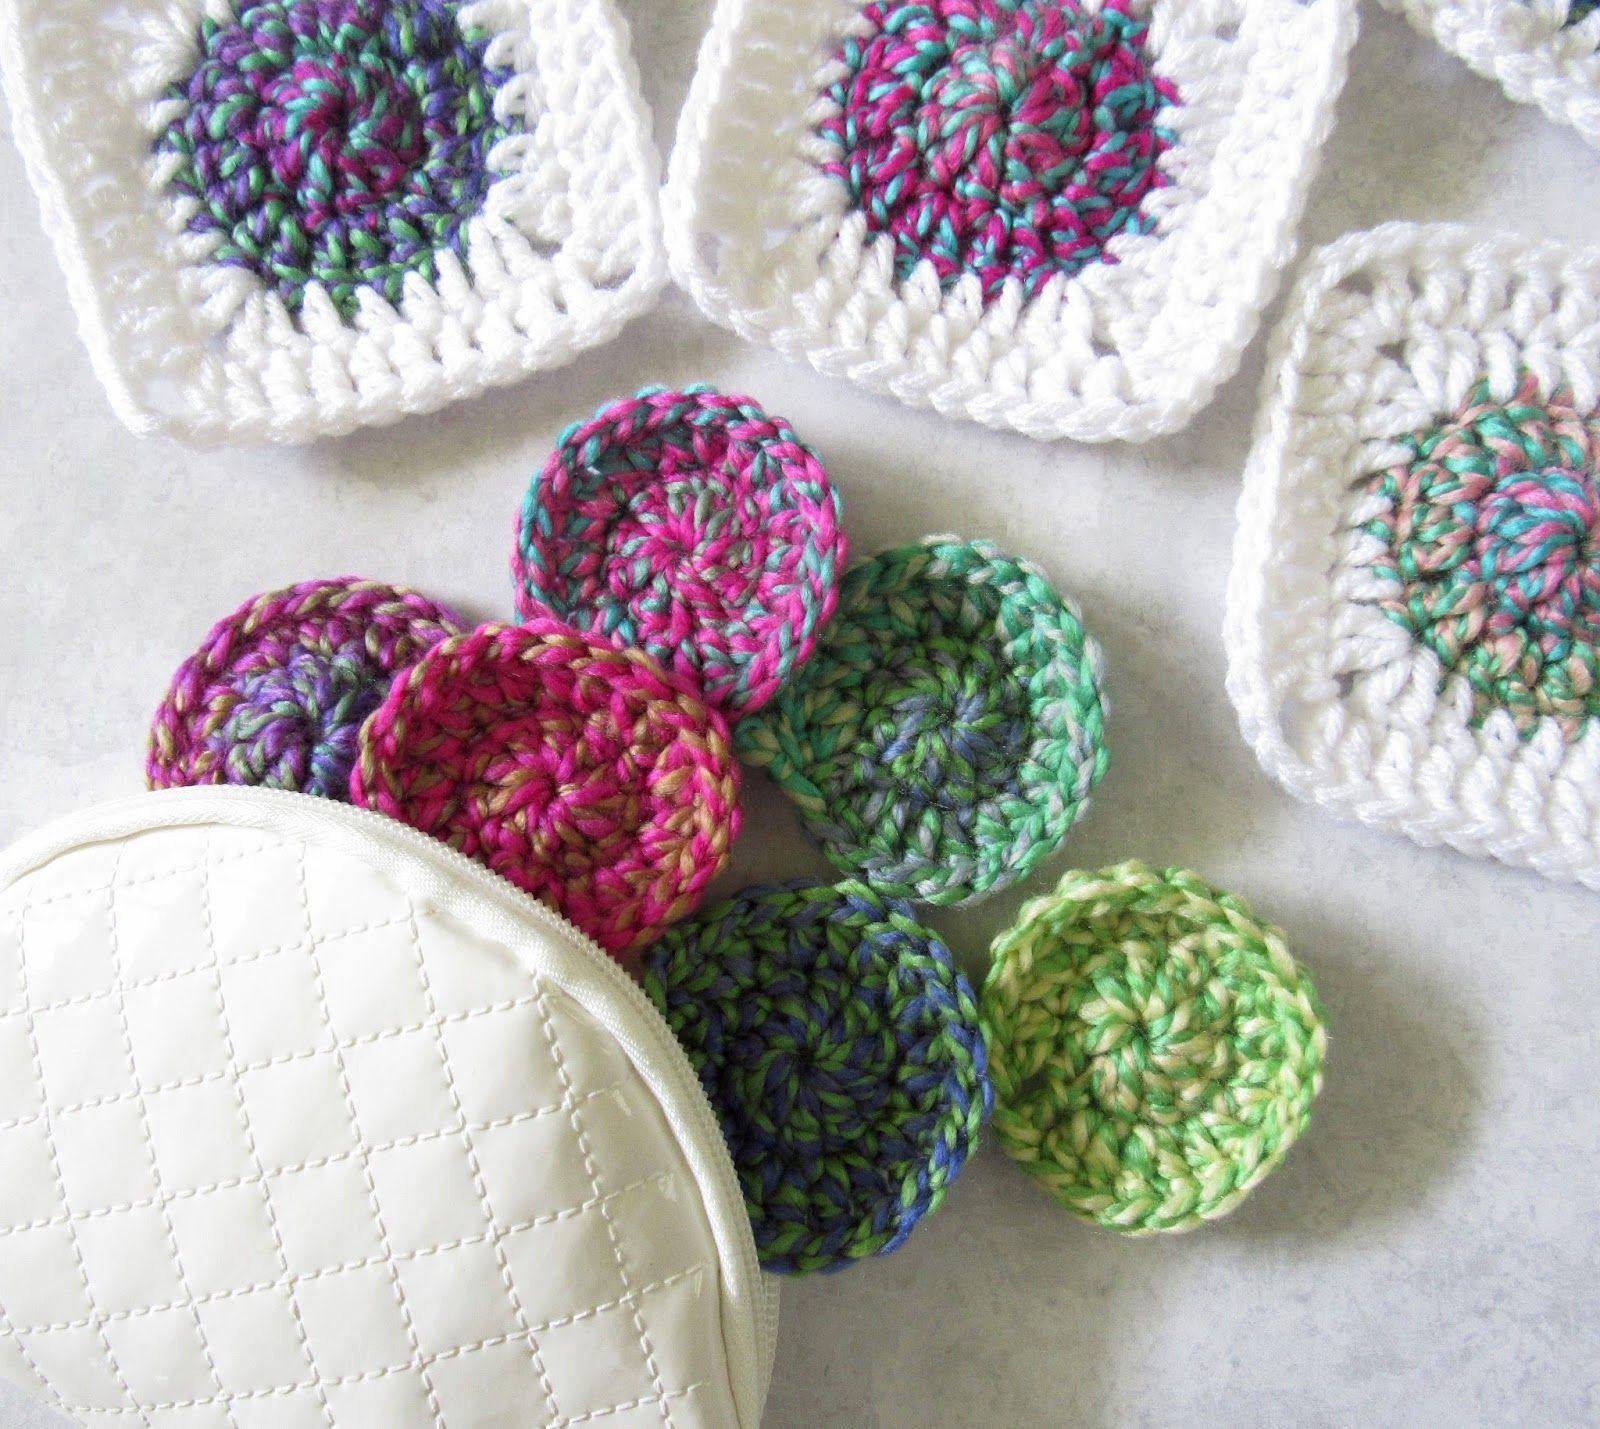 Sunburst Granny Square Crochet Pattern | La abuela, Cuadrados y Abuelas